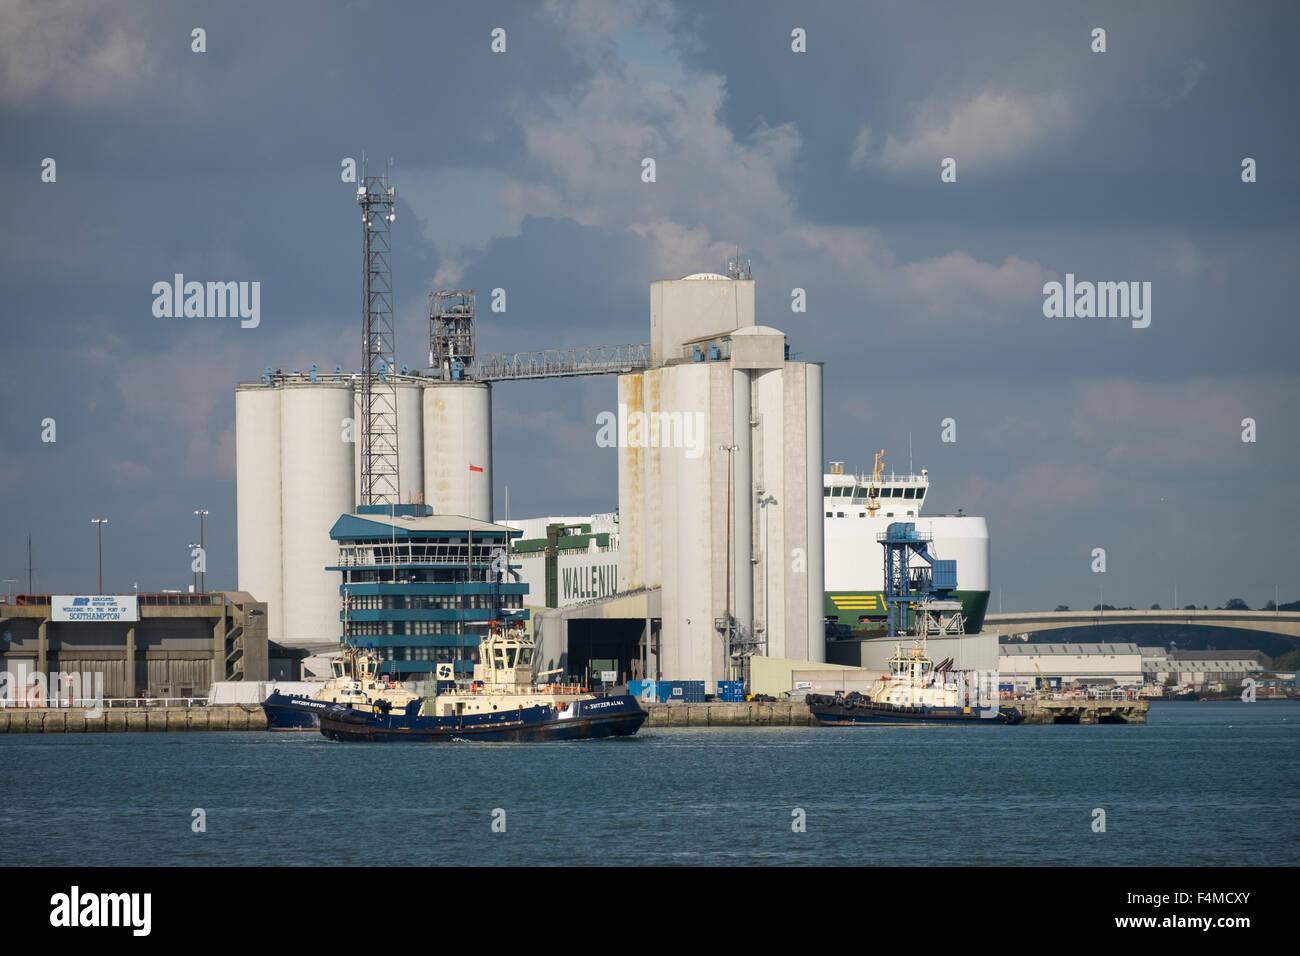 Dock Head in Southampton Docks, Southampton, Hampshire, UK - Stock Image